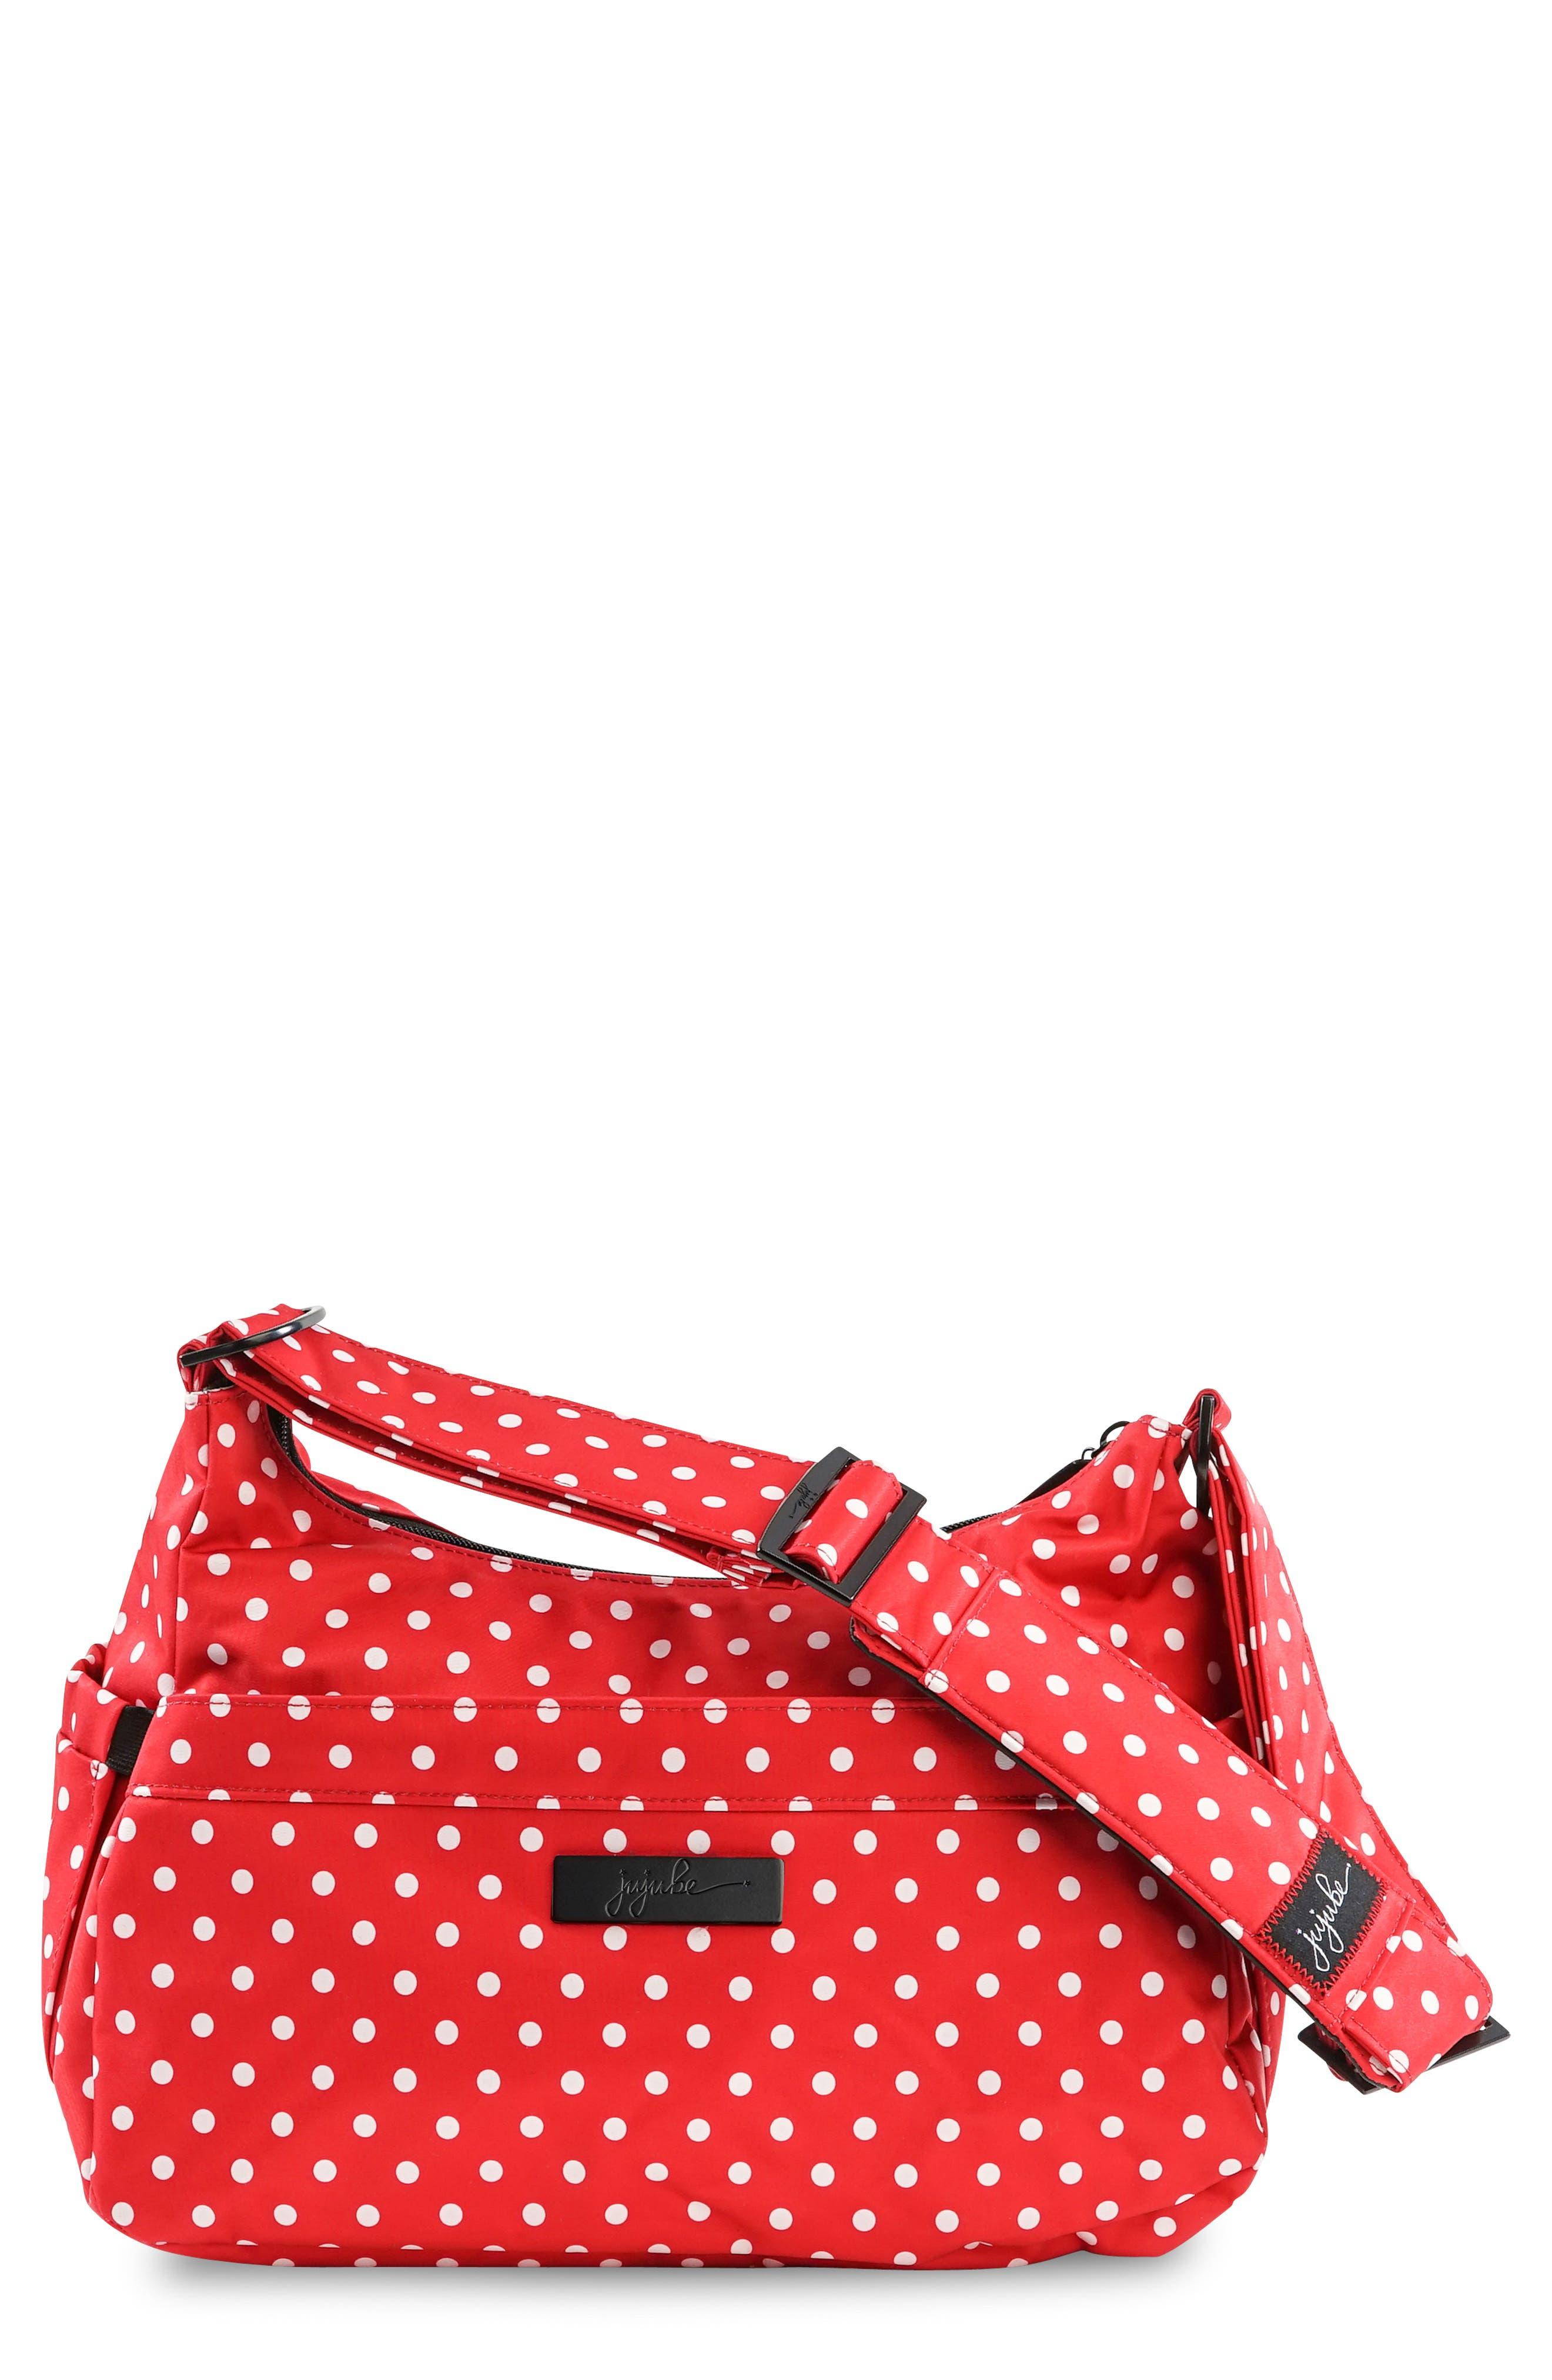 'HoboBe' Diaper Bag,                             Main thumbnail 1, color,                             Black Ruby